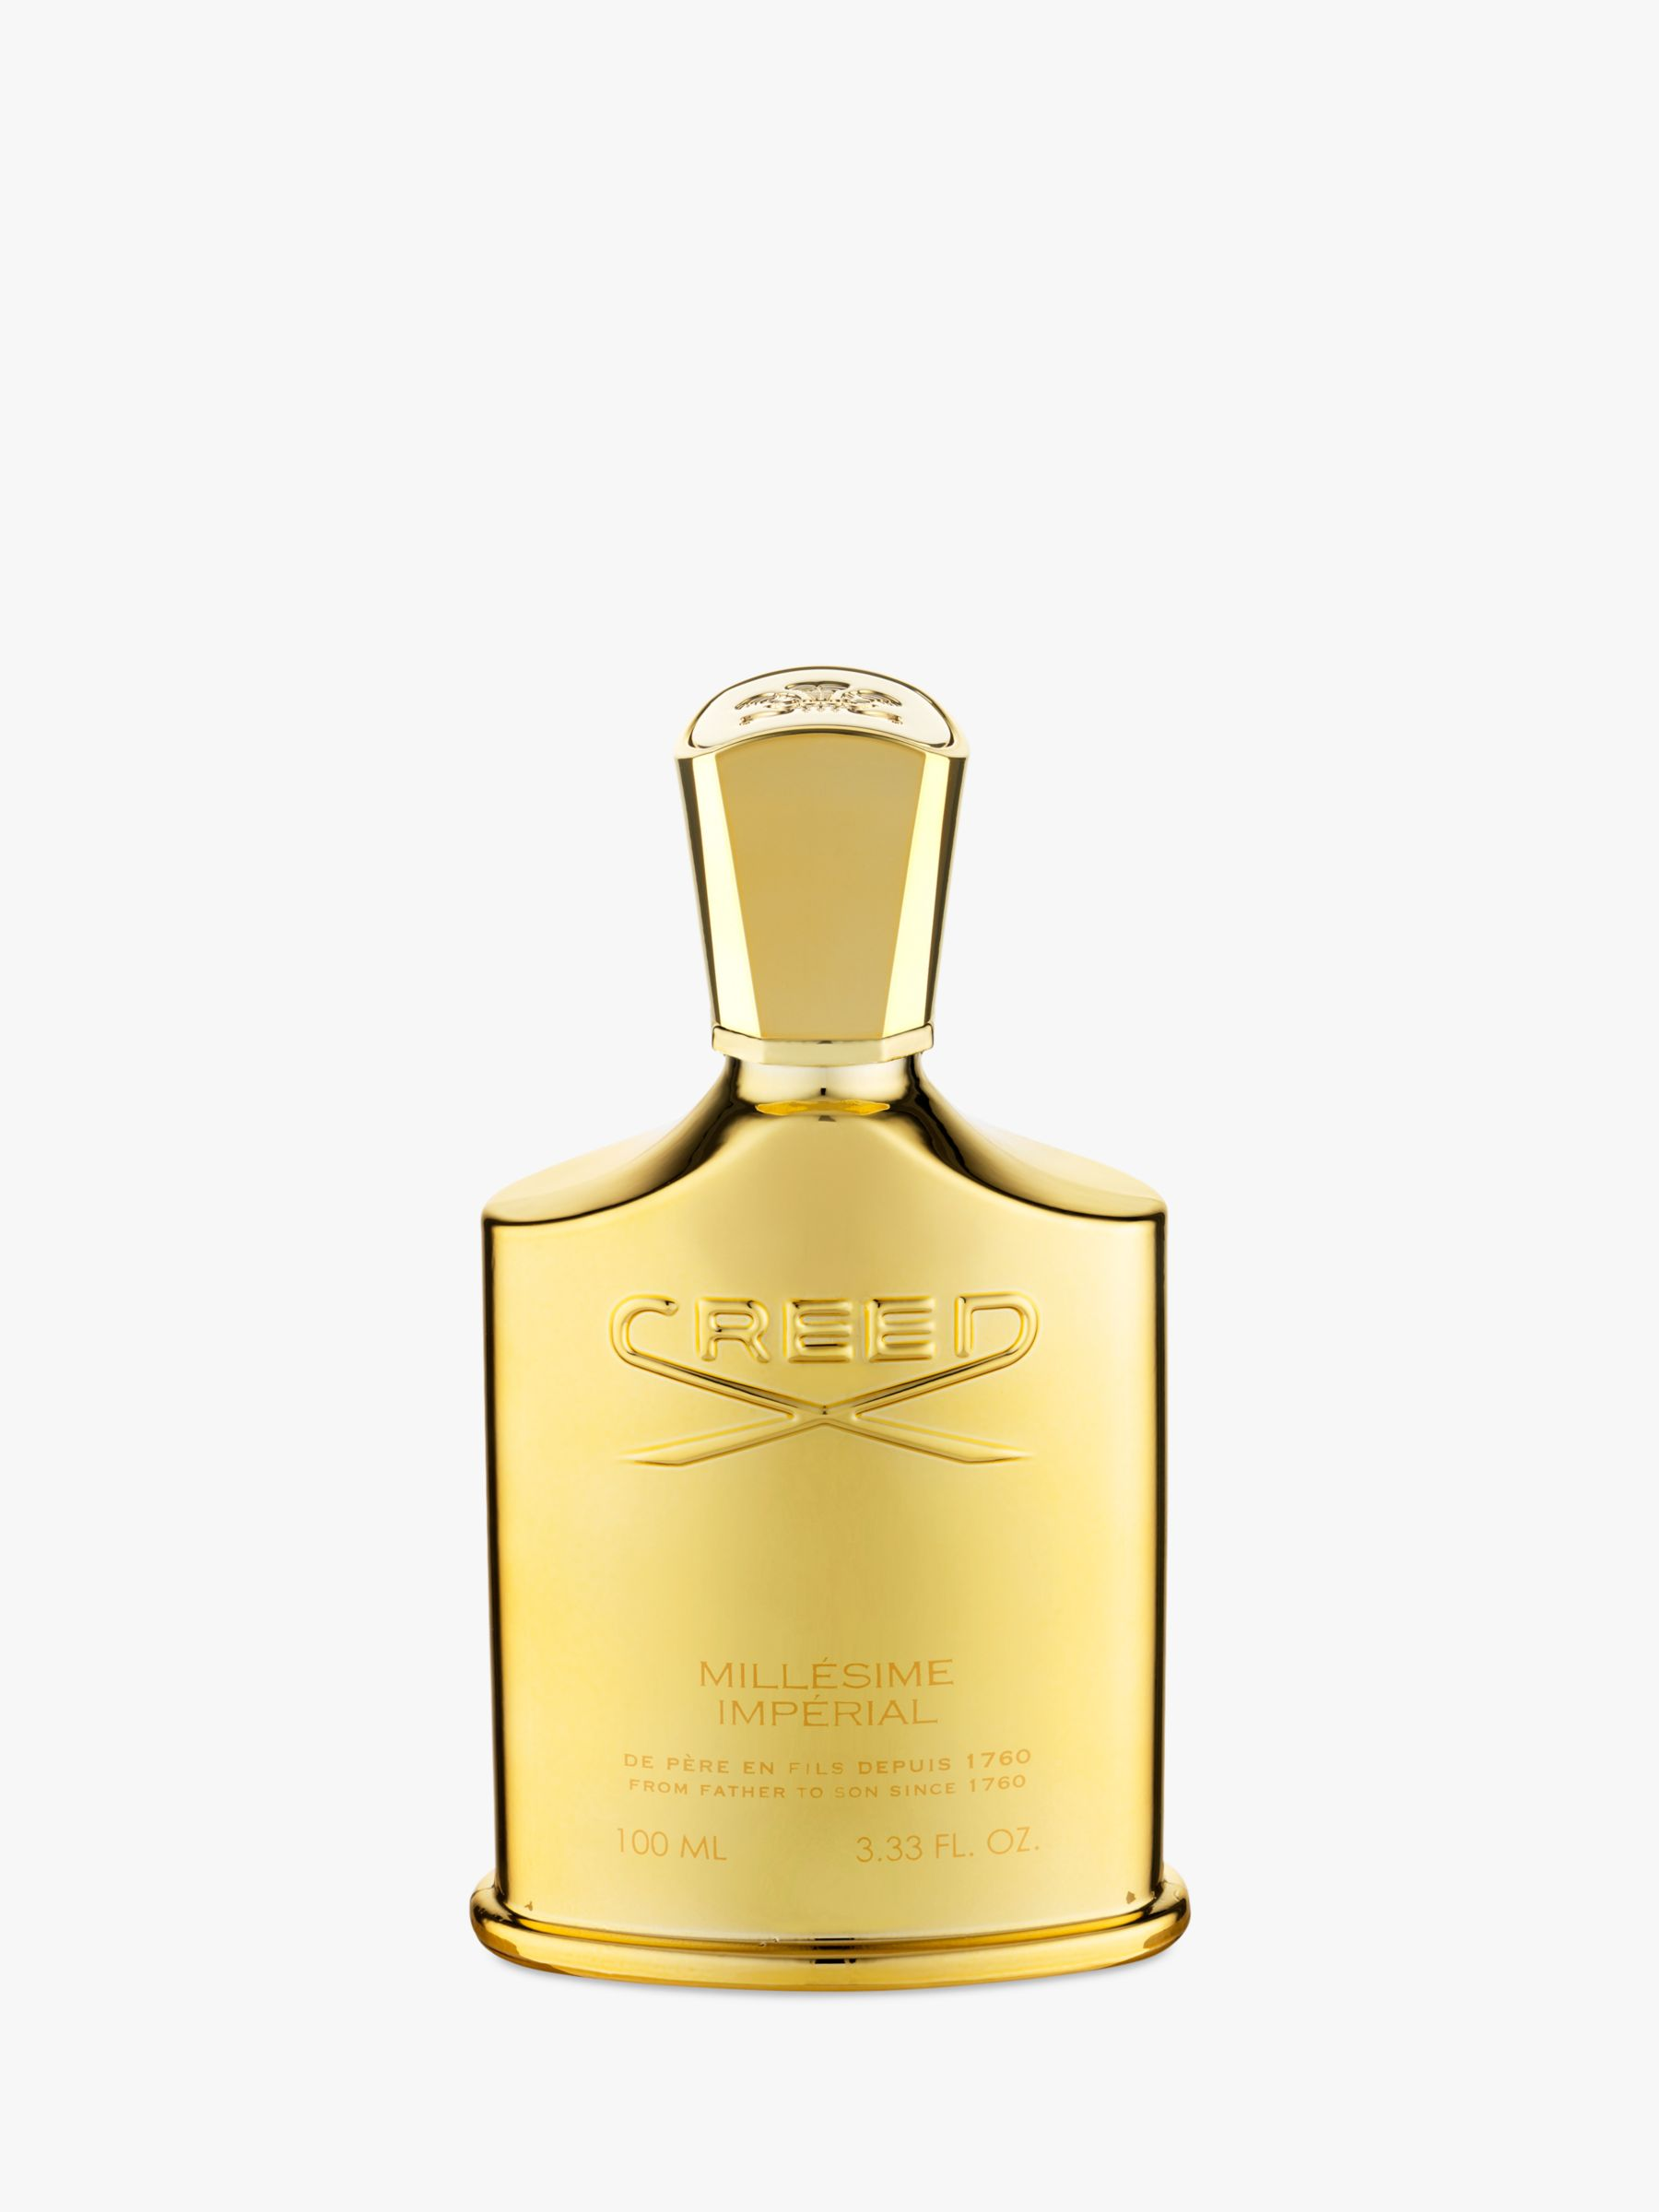 Creed CREED Millésime Imperial Eau de Parfum, 100ml